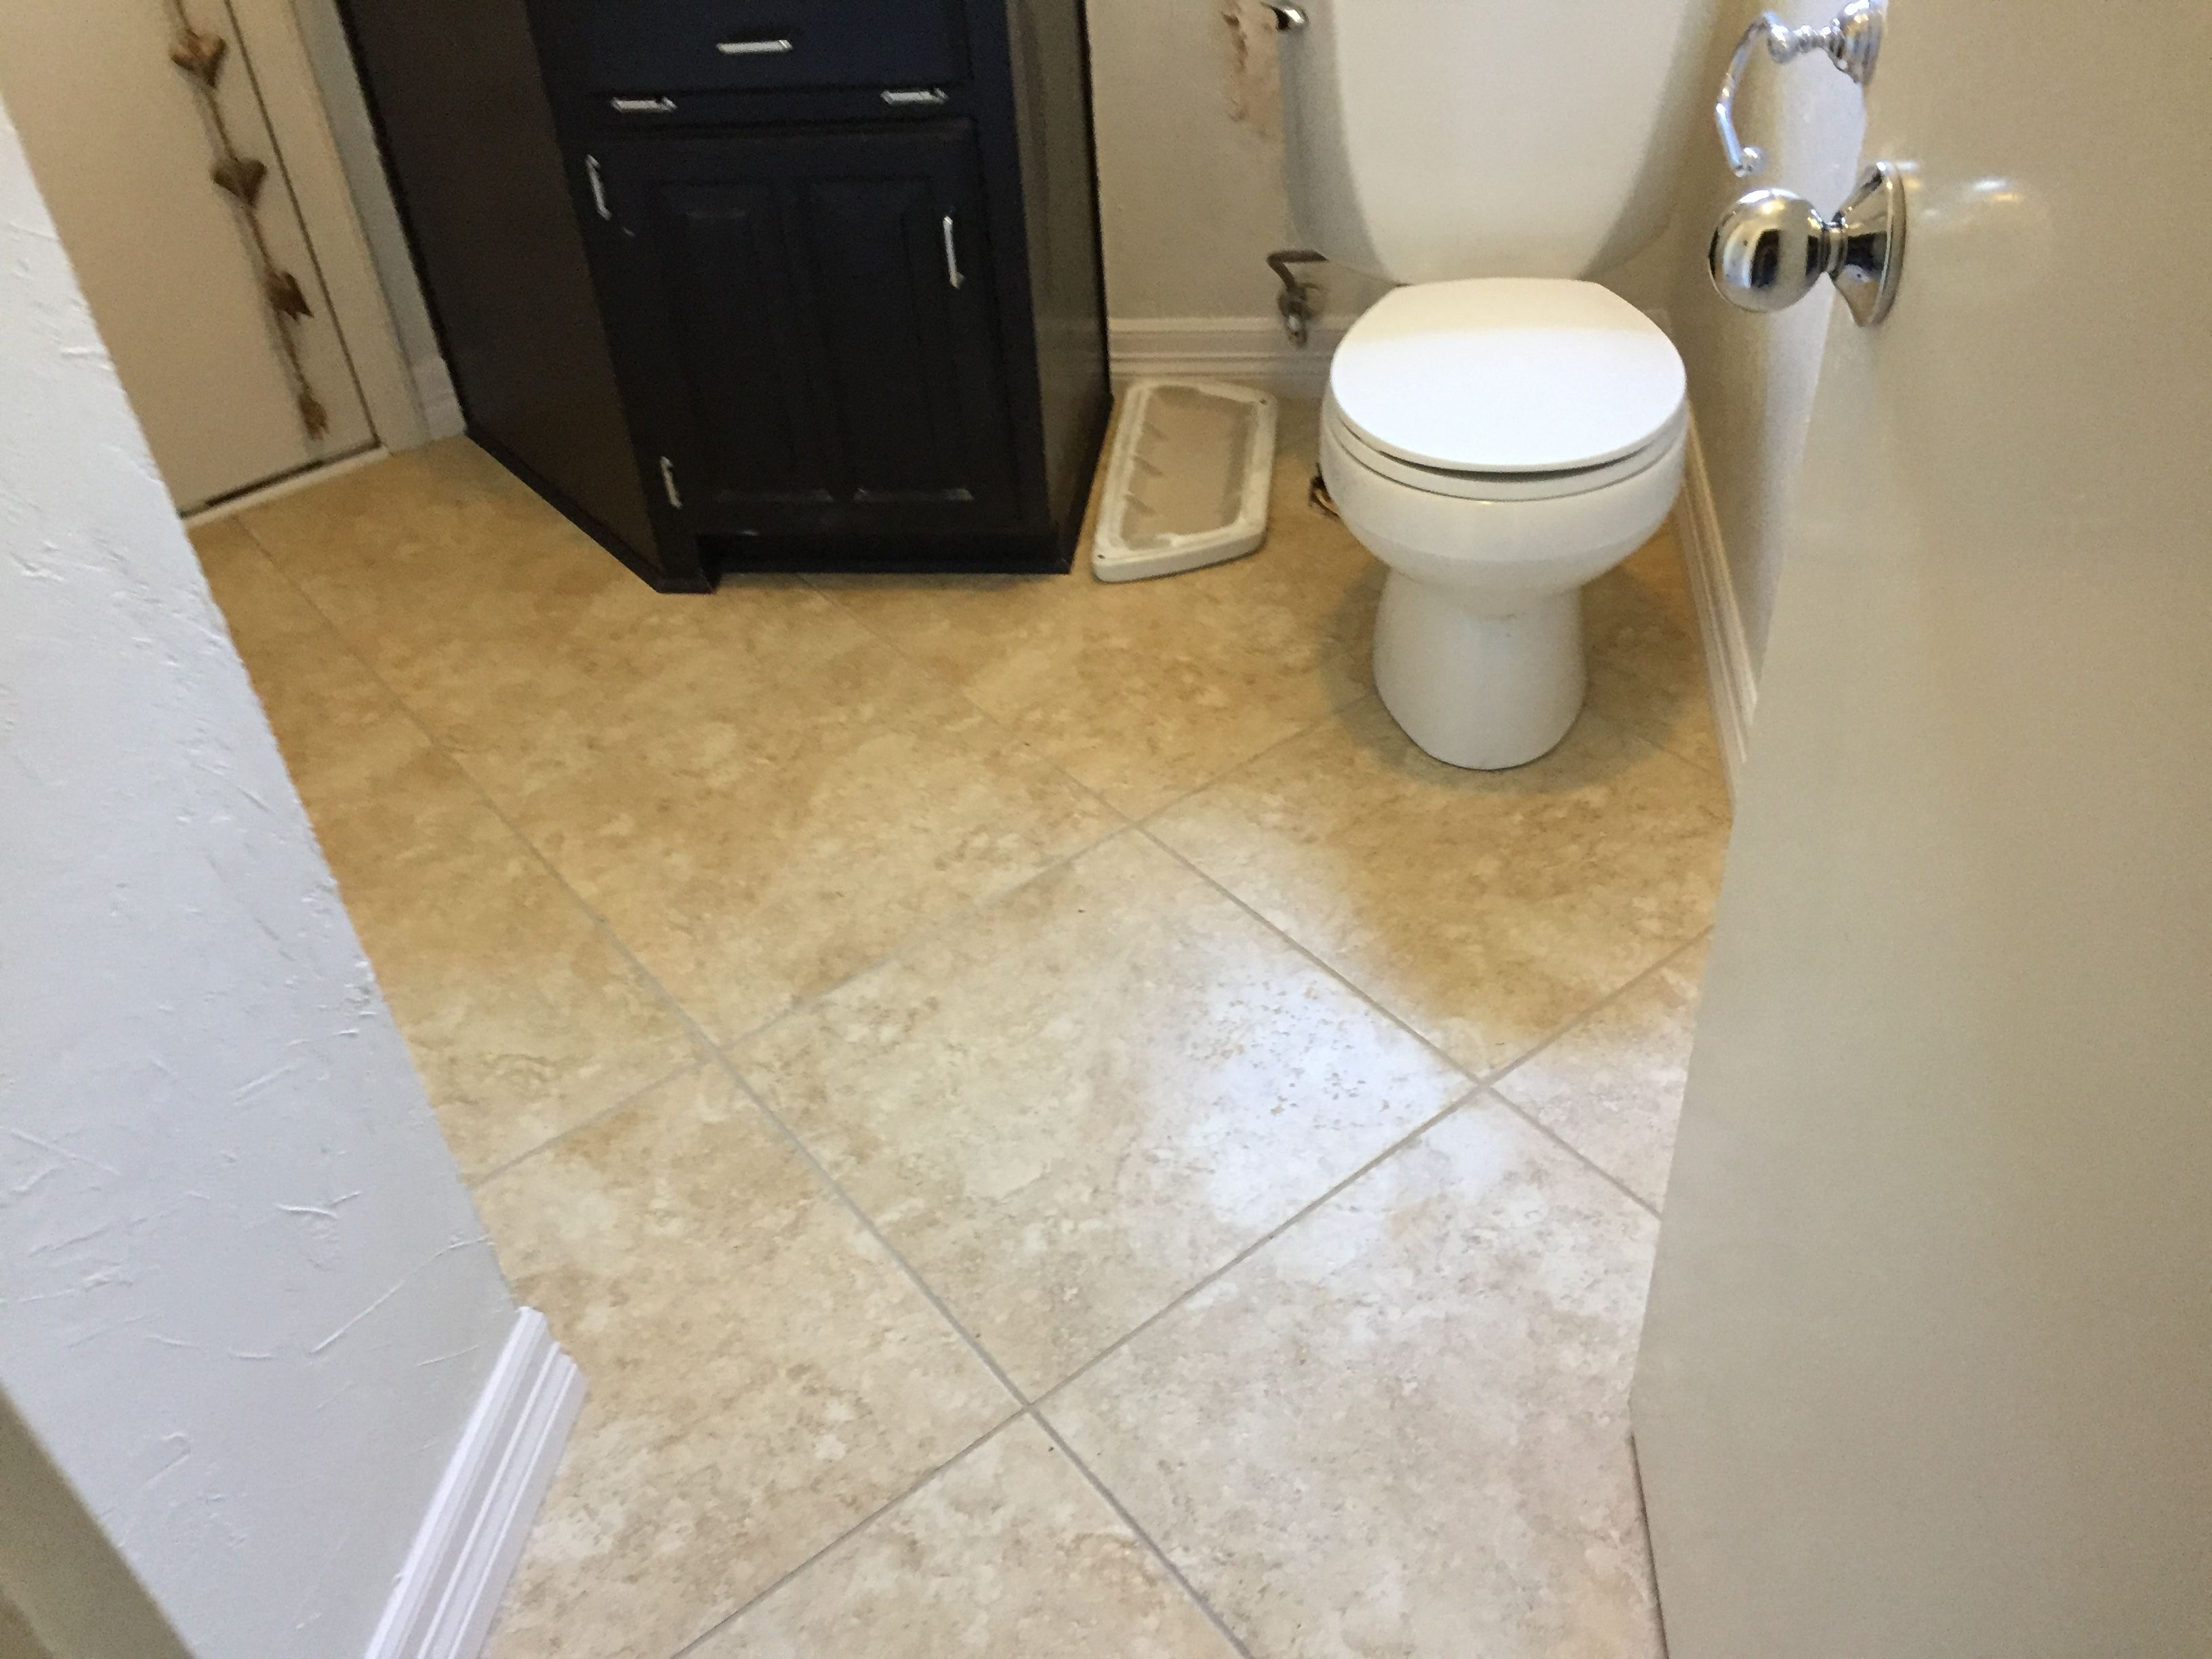 20x20 Tile In Small Bathroom Stone Flooring Small Bathroom Tiles